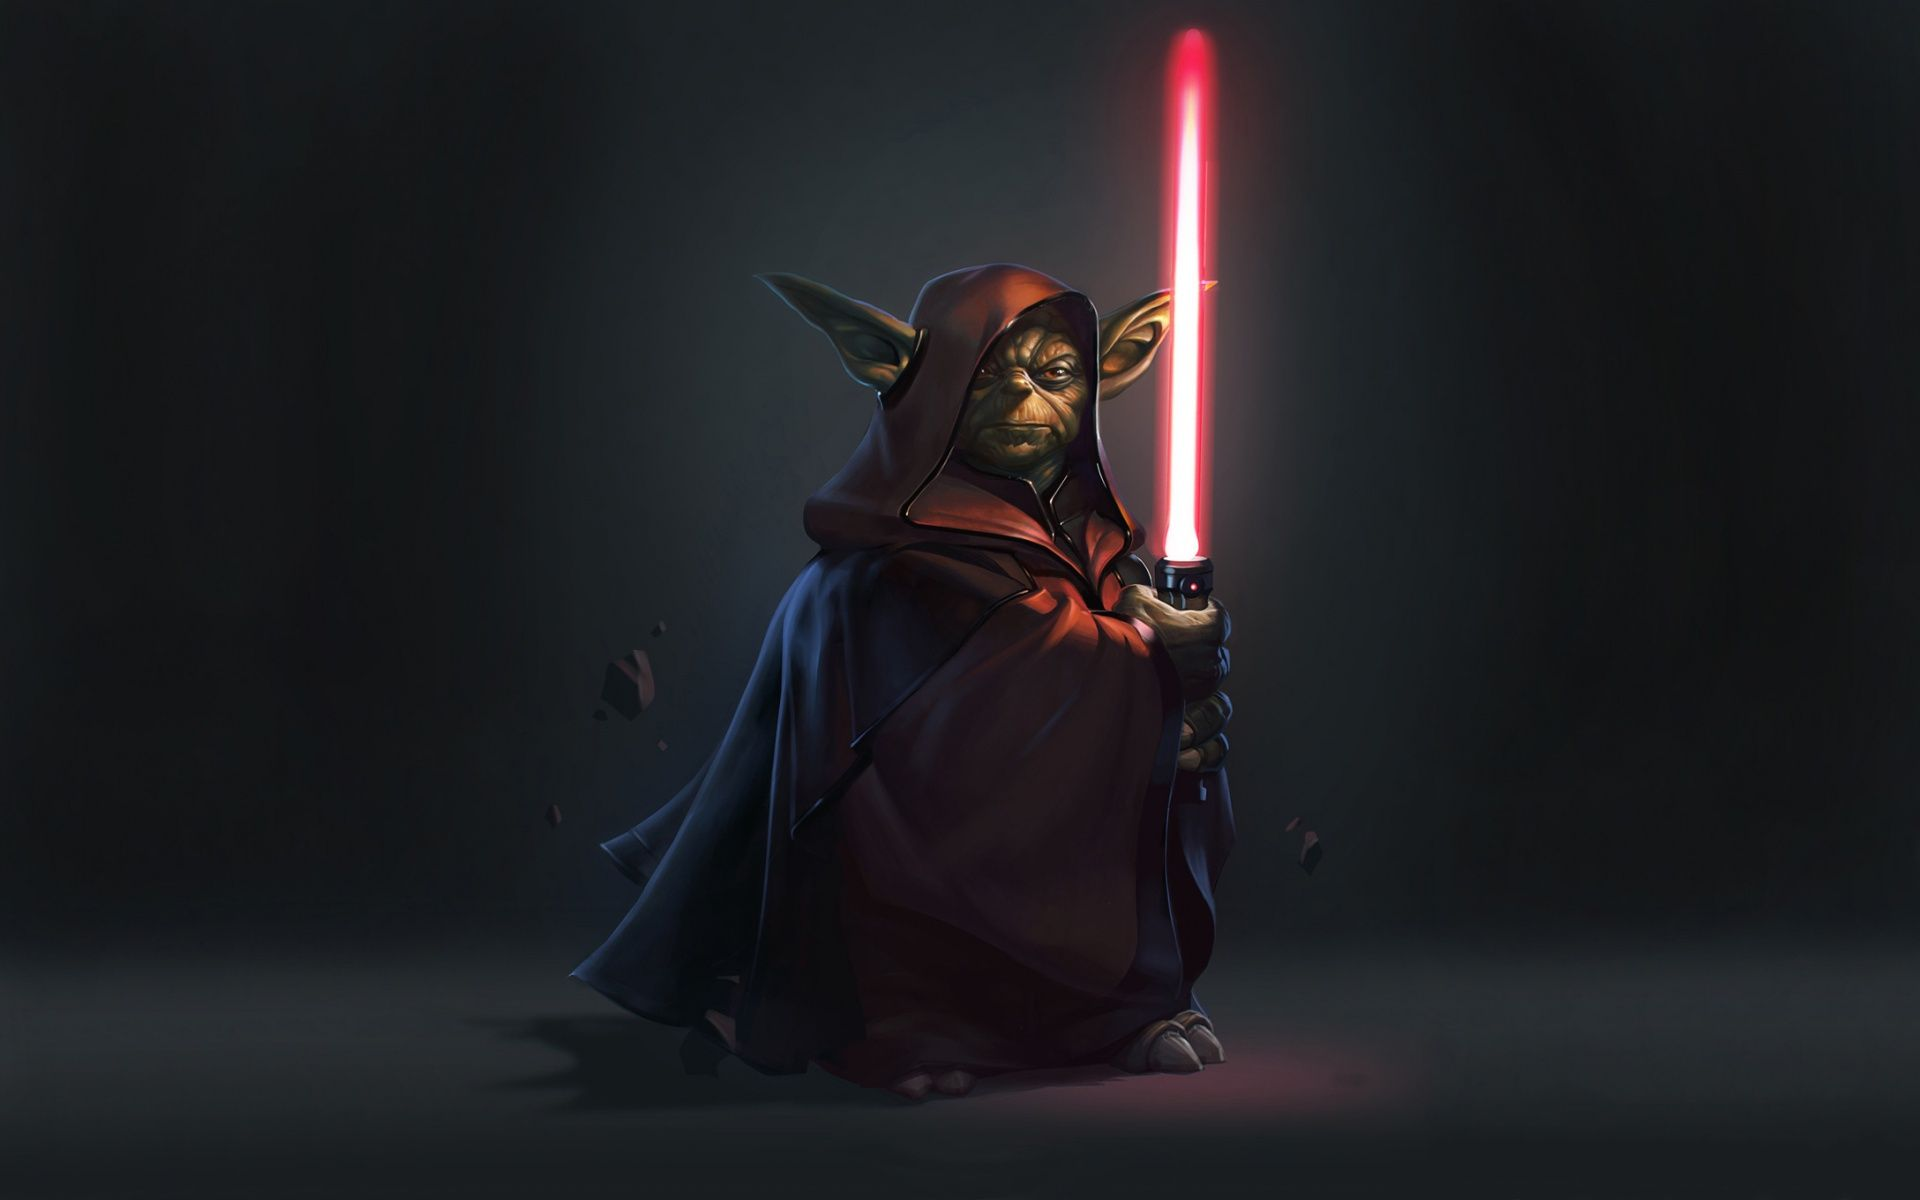 Darth Yoda Wallpapers Top Free Darth Yoda Backgrounds Wallpaperaccess